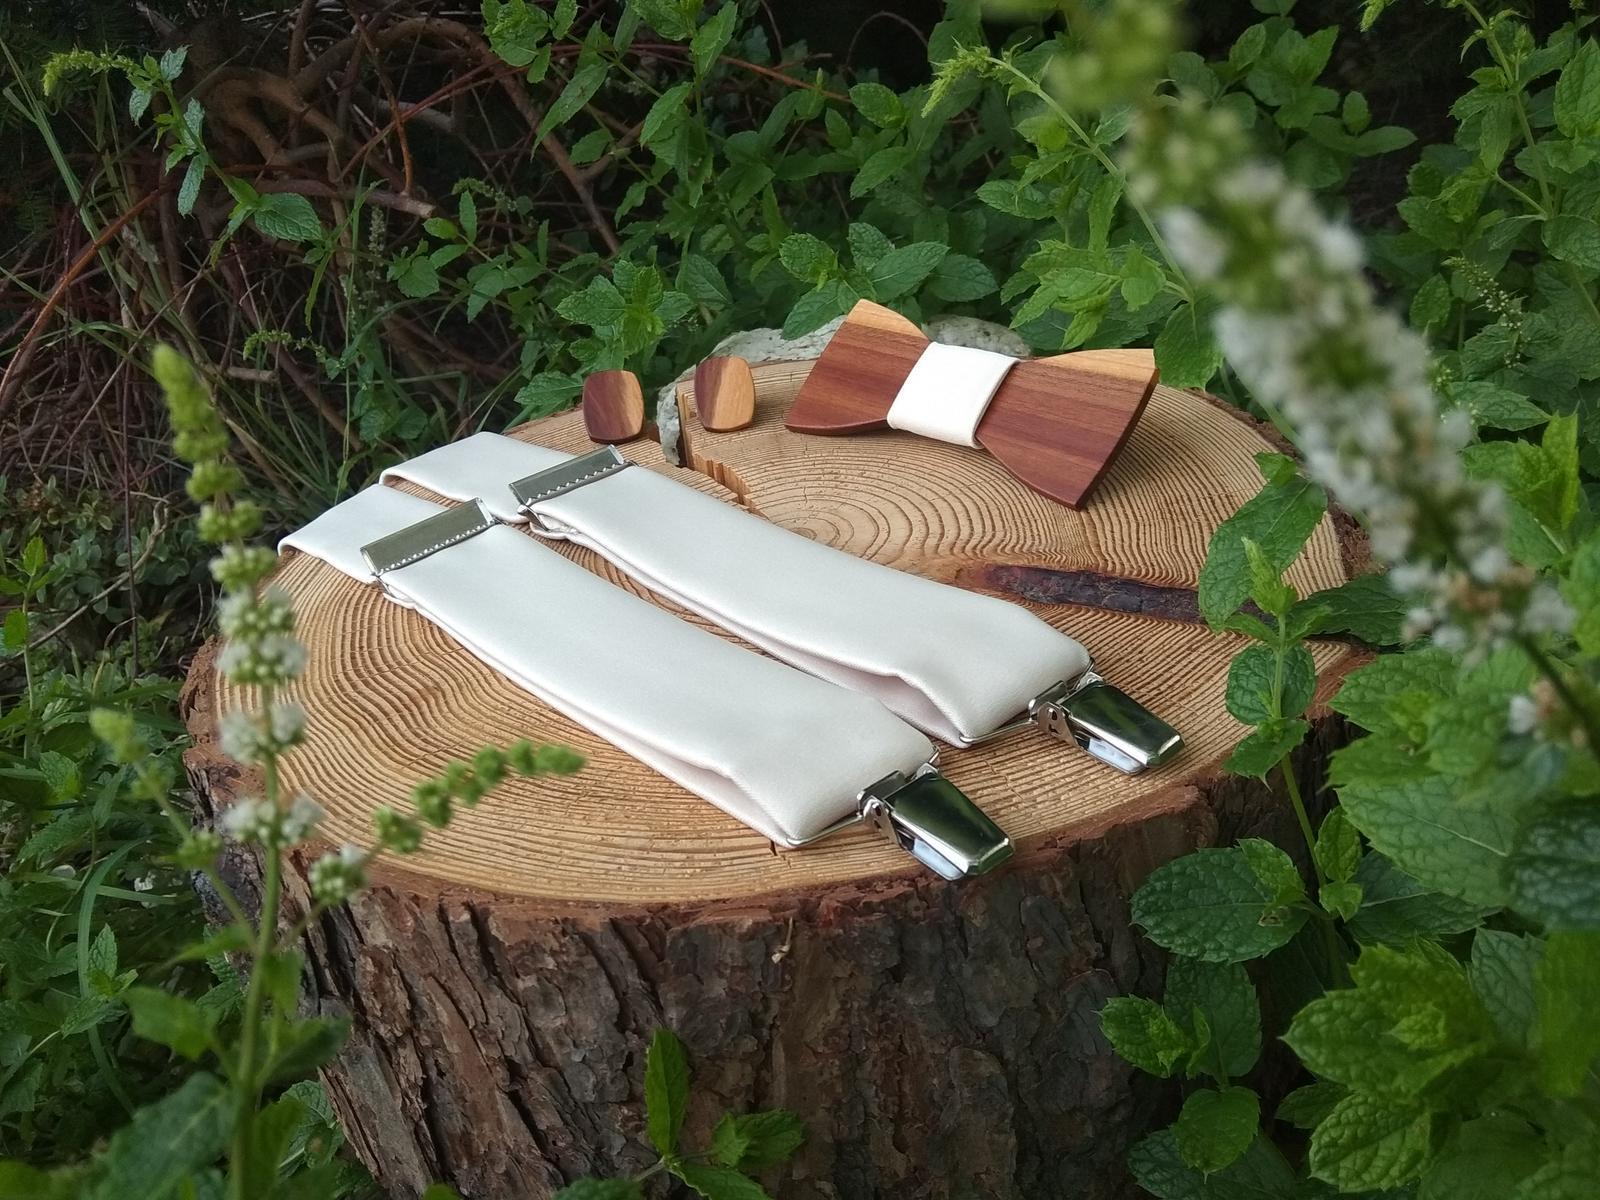 Pánsky drevený motýlik, manžetové gombíky a traky - Obrázok č. 4